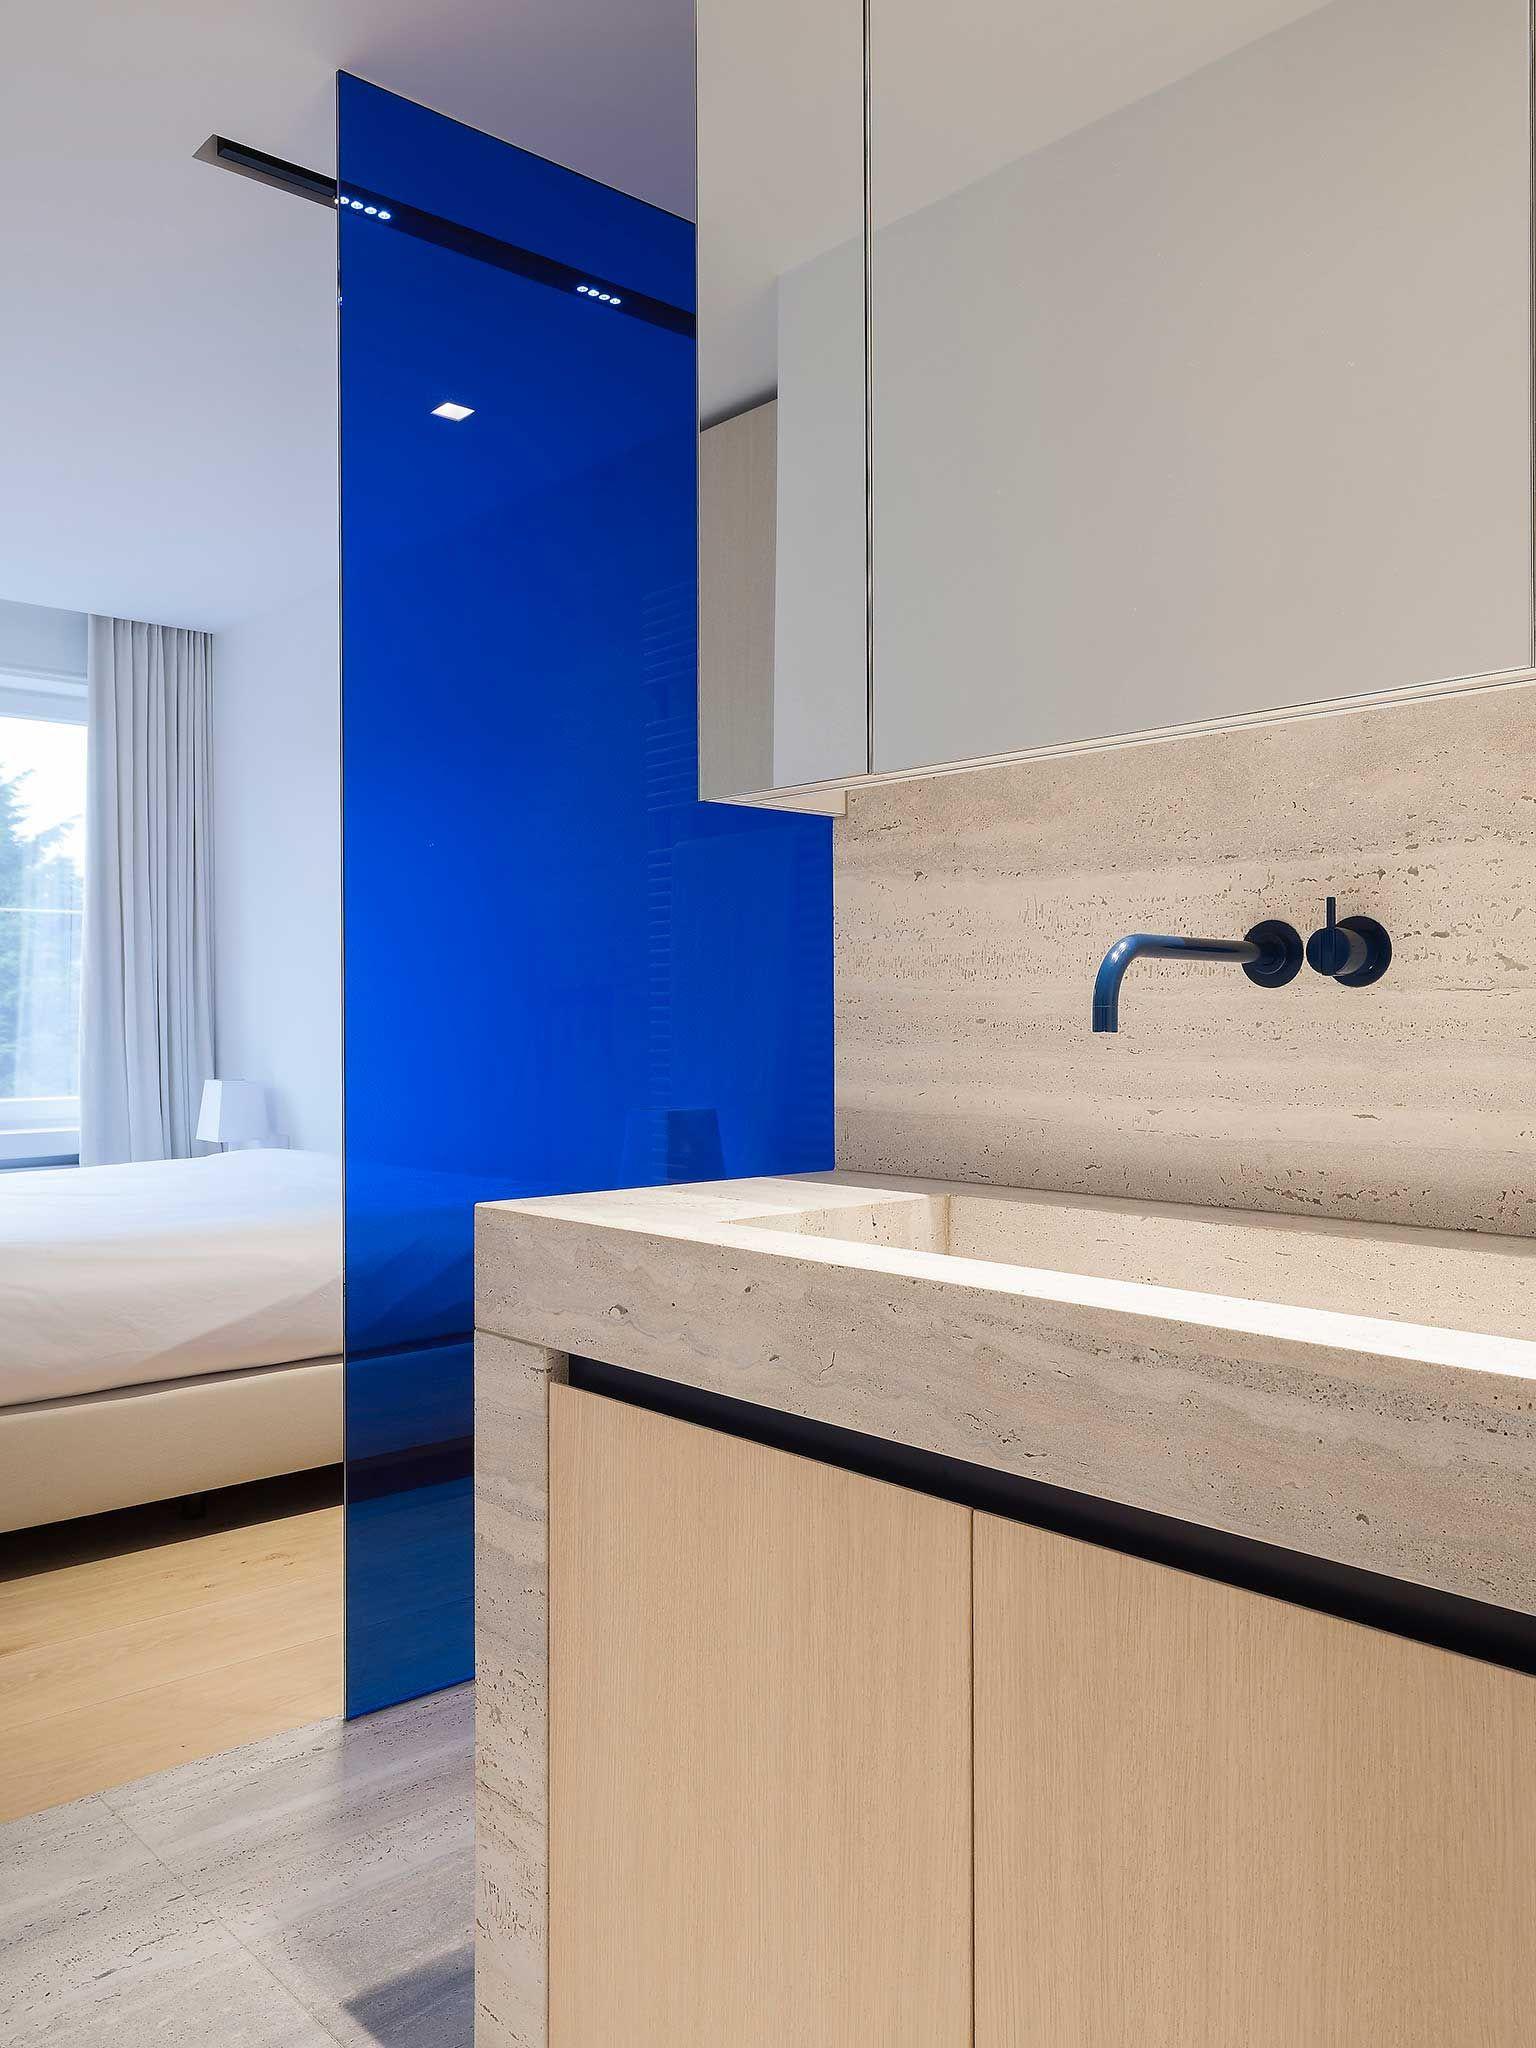 Obumex   Window Treatments   Interior   Bedroom   Design   Obumex ...